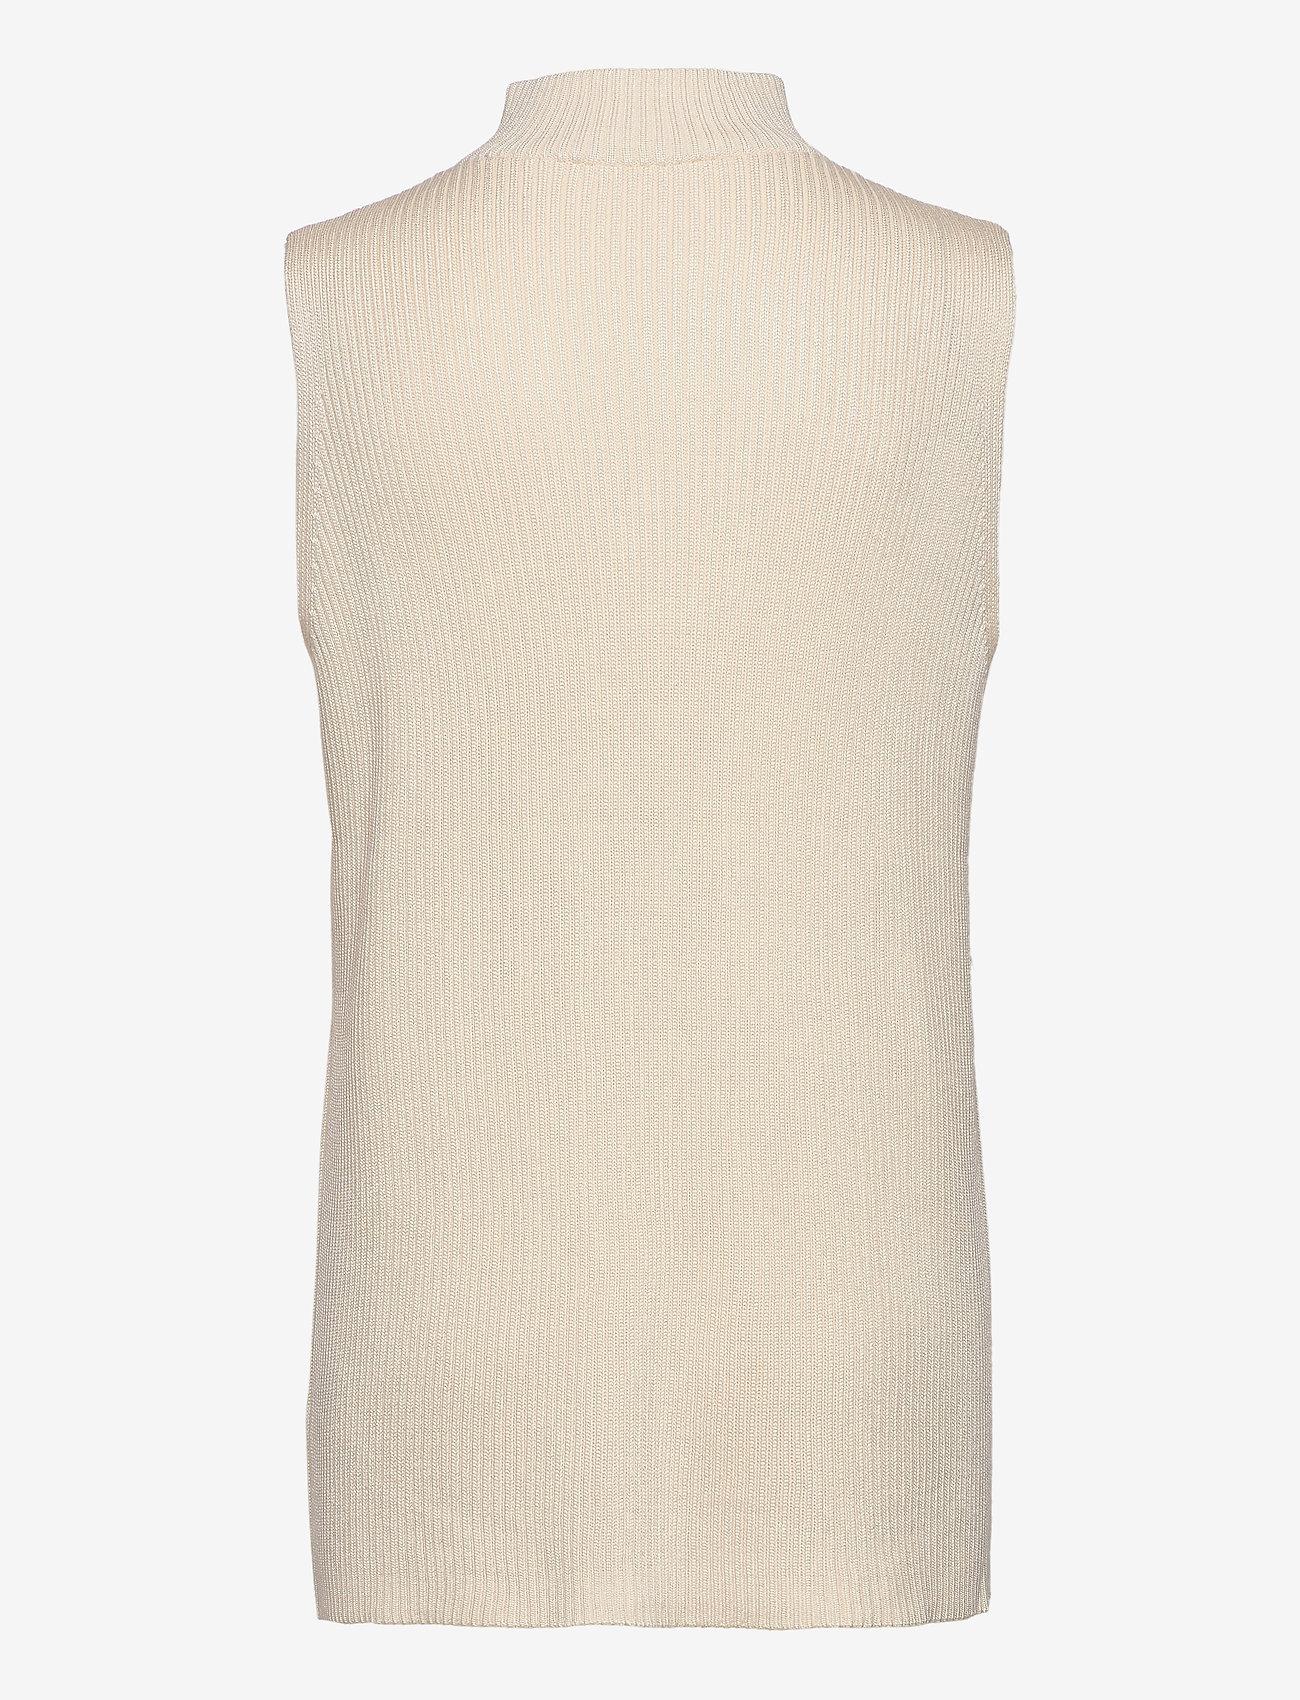 RODEBJER - RODEBJER LADA - knitted vests - ceramic white - 1